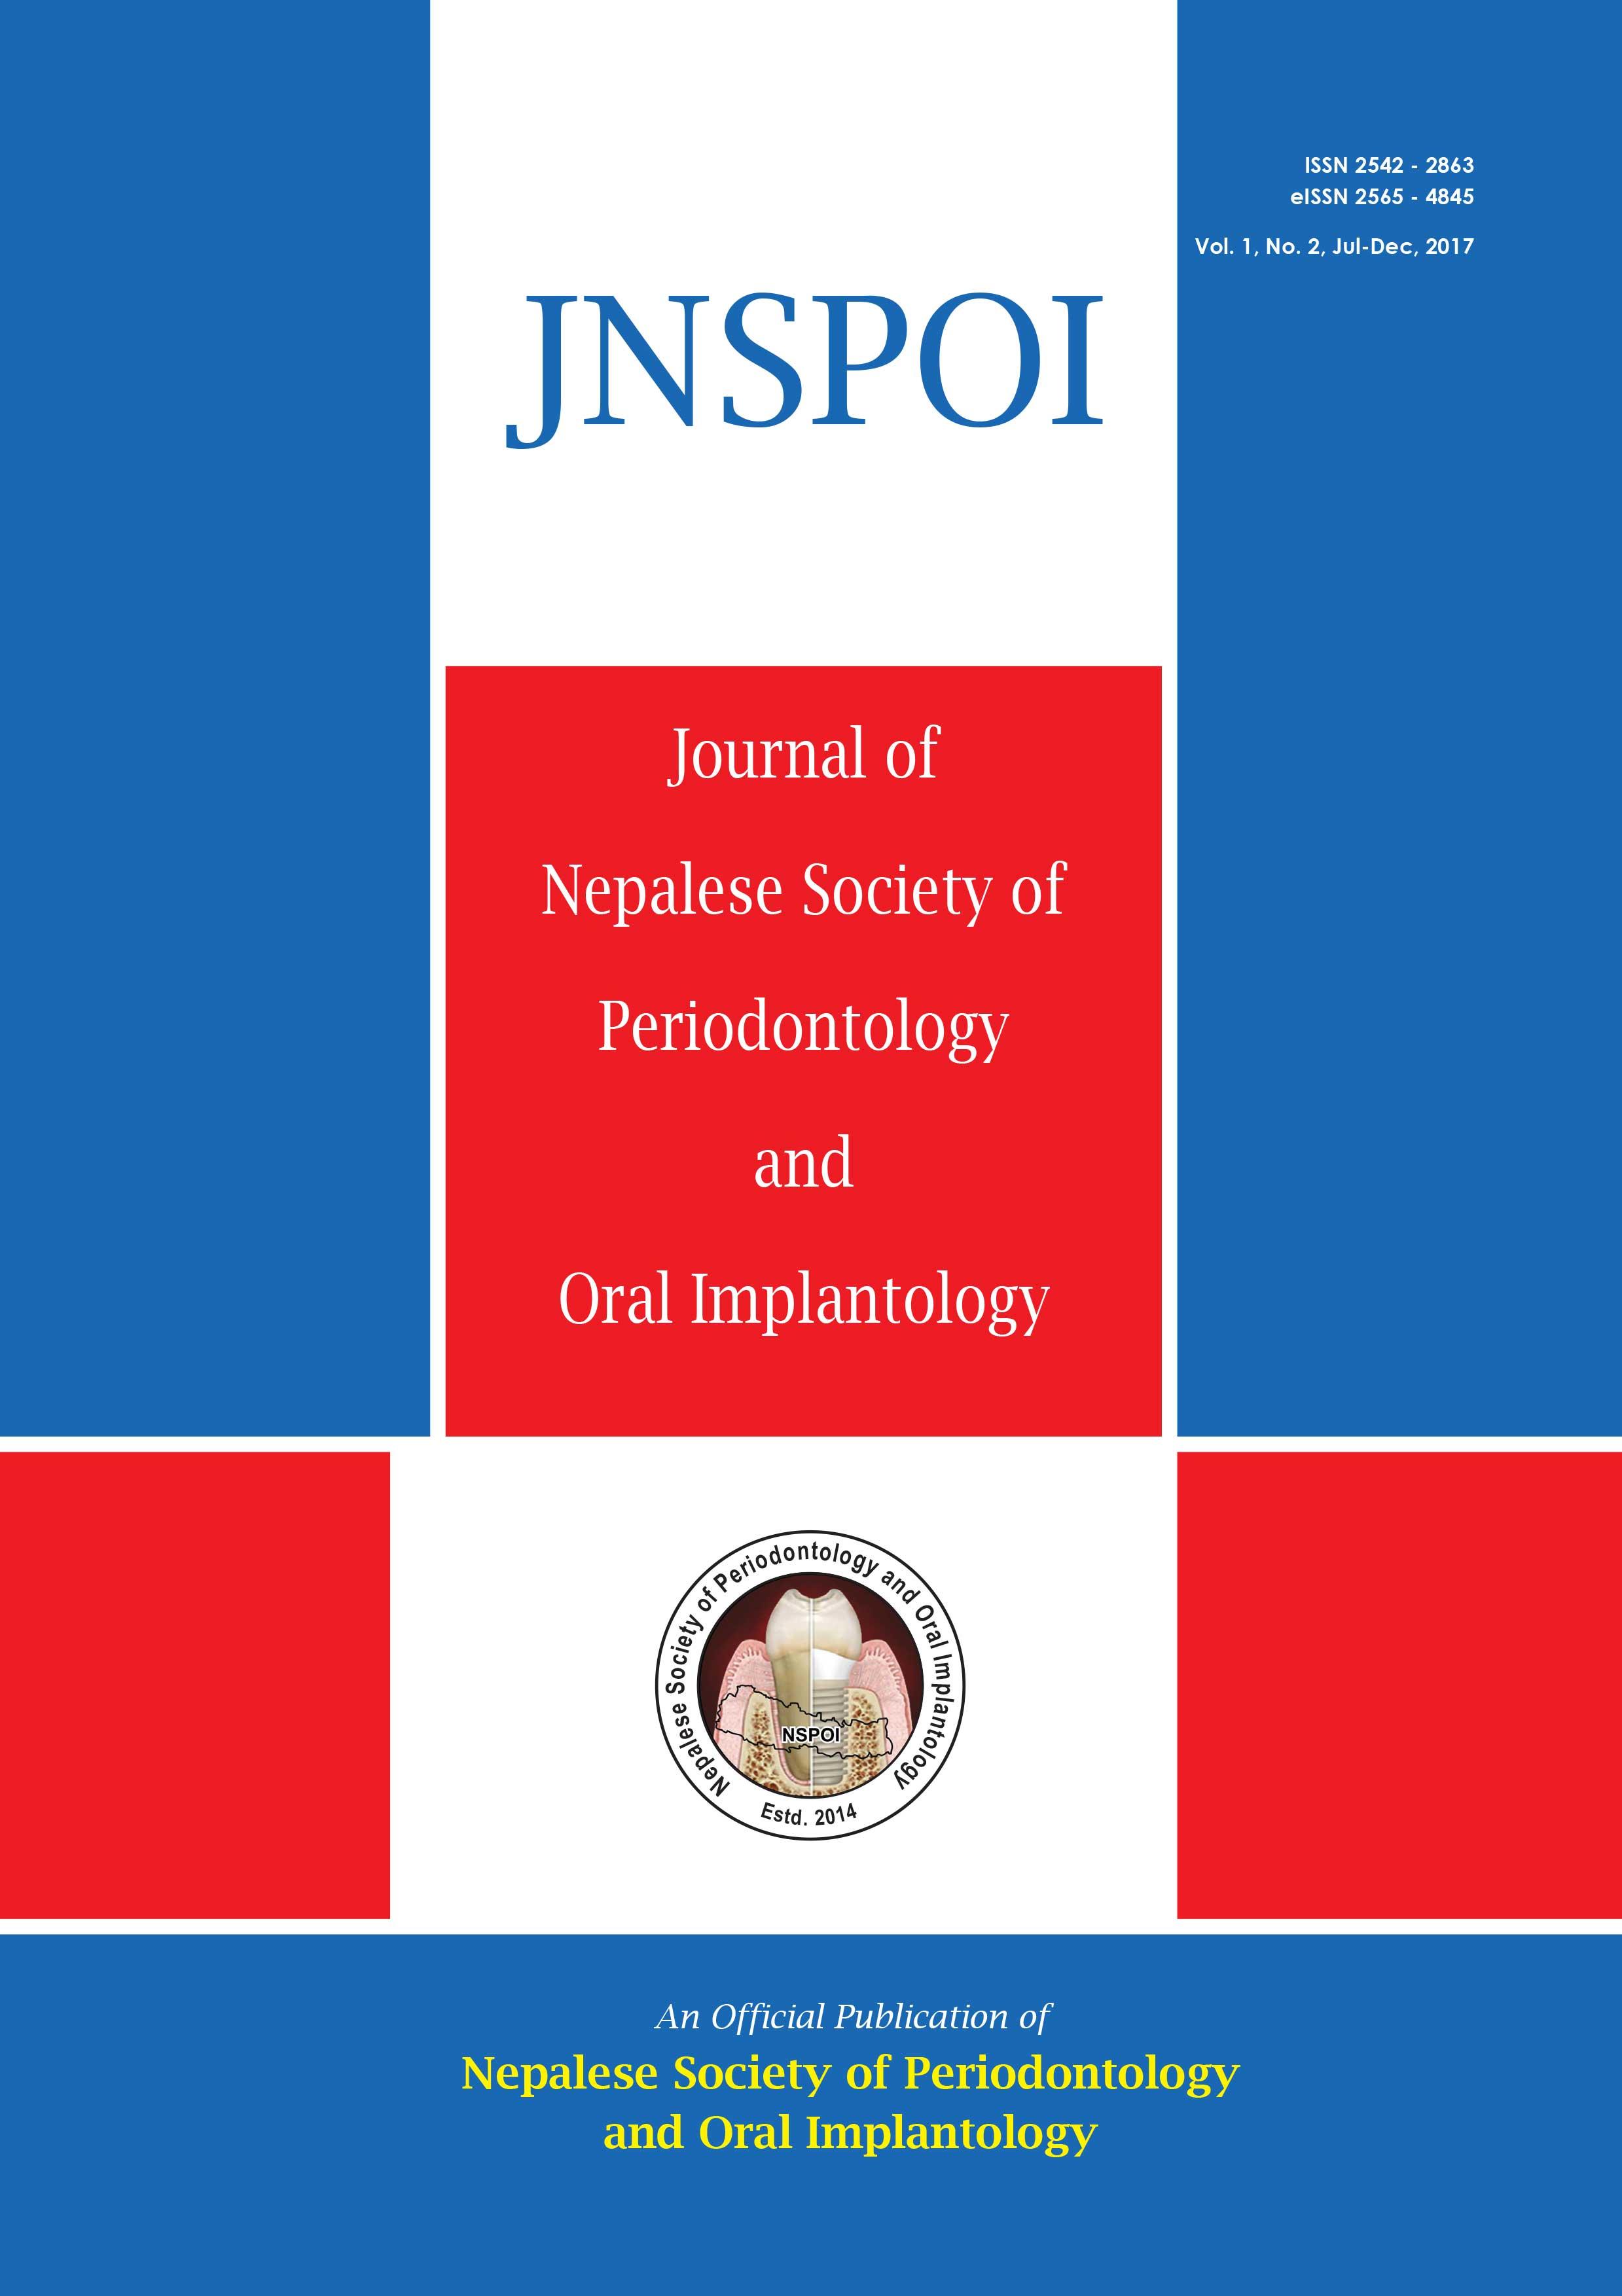 JNSPOI - Vol 1 - No 2